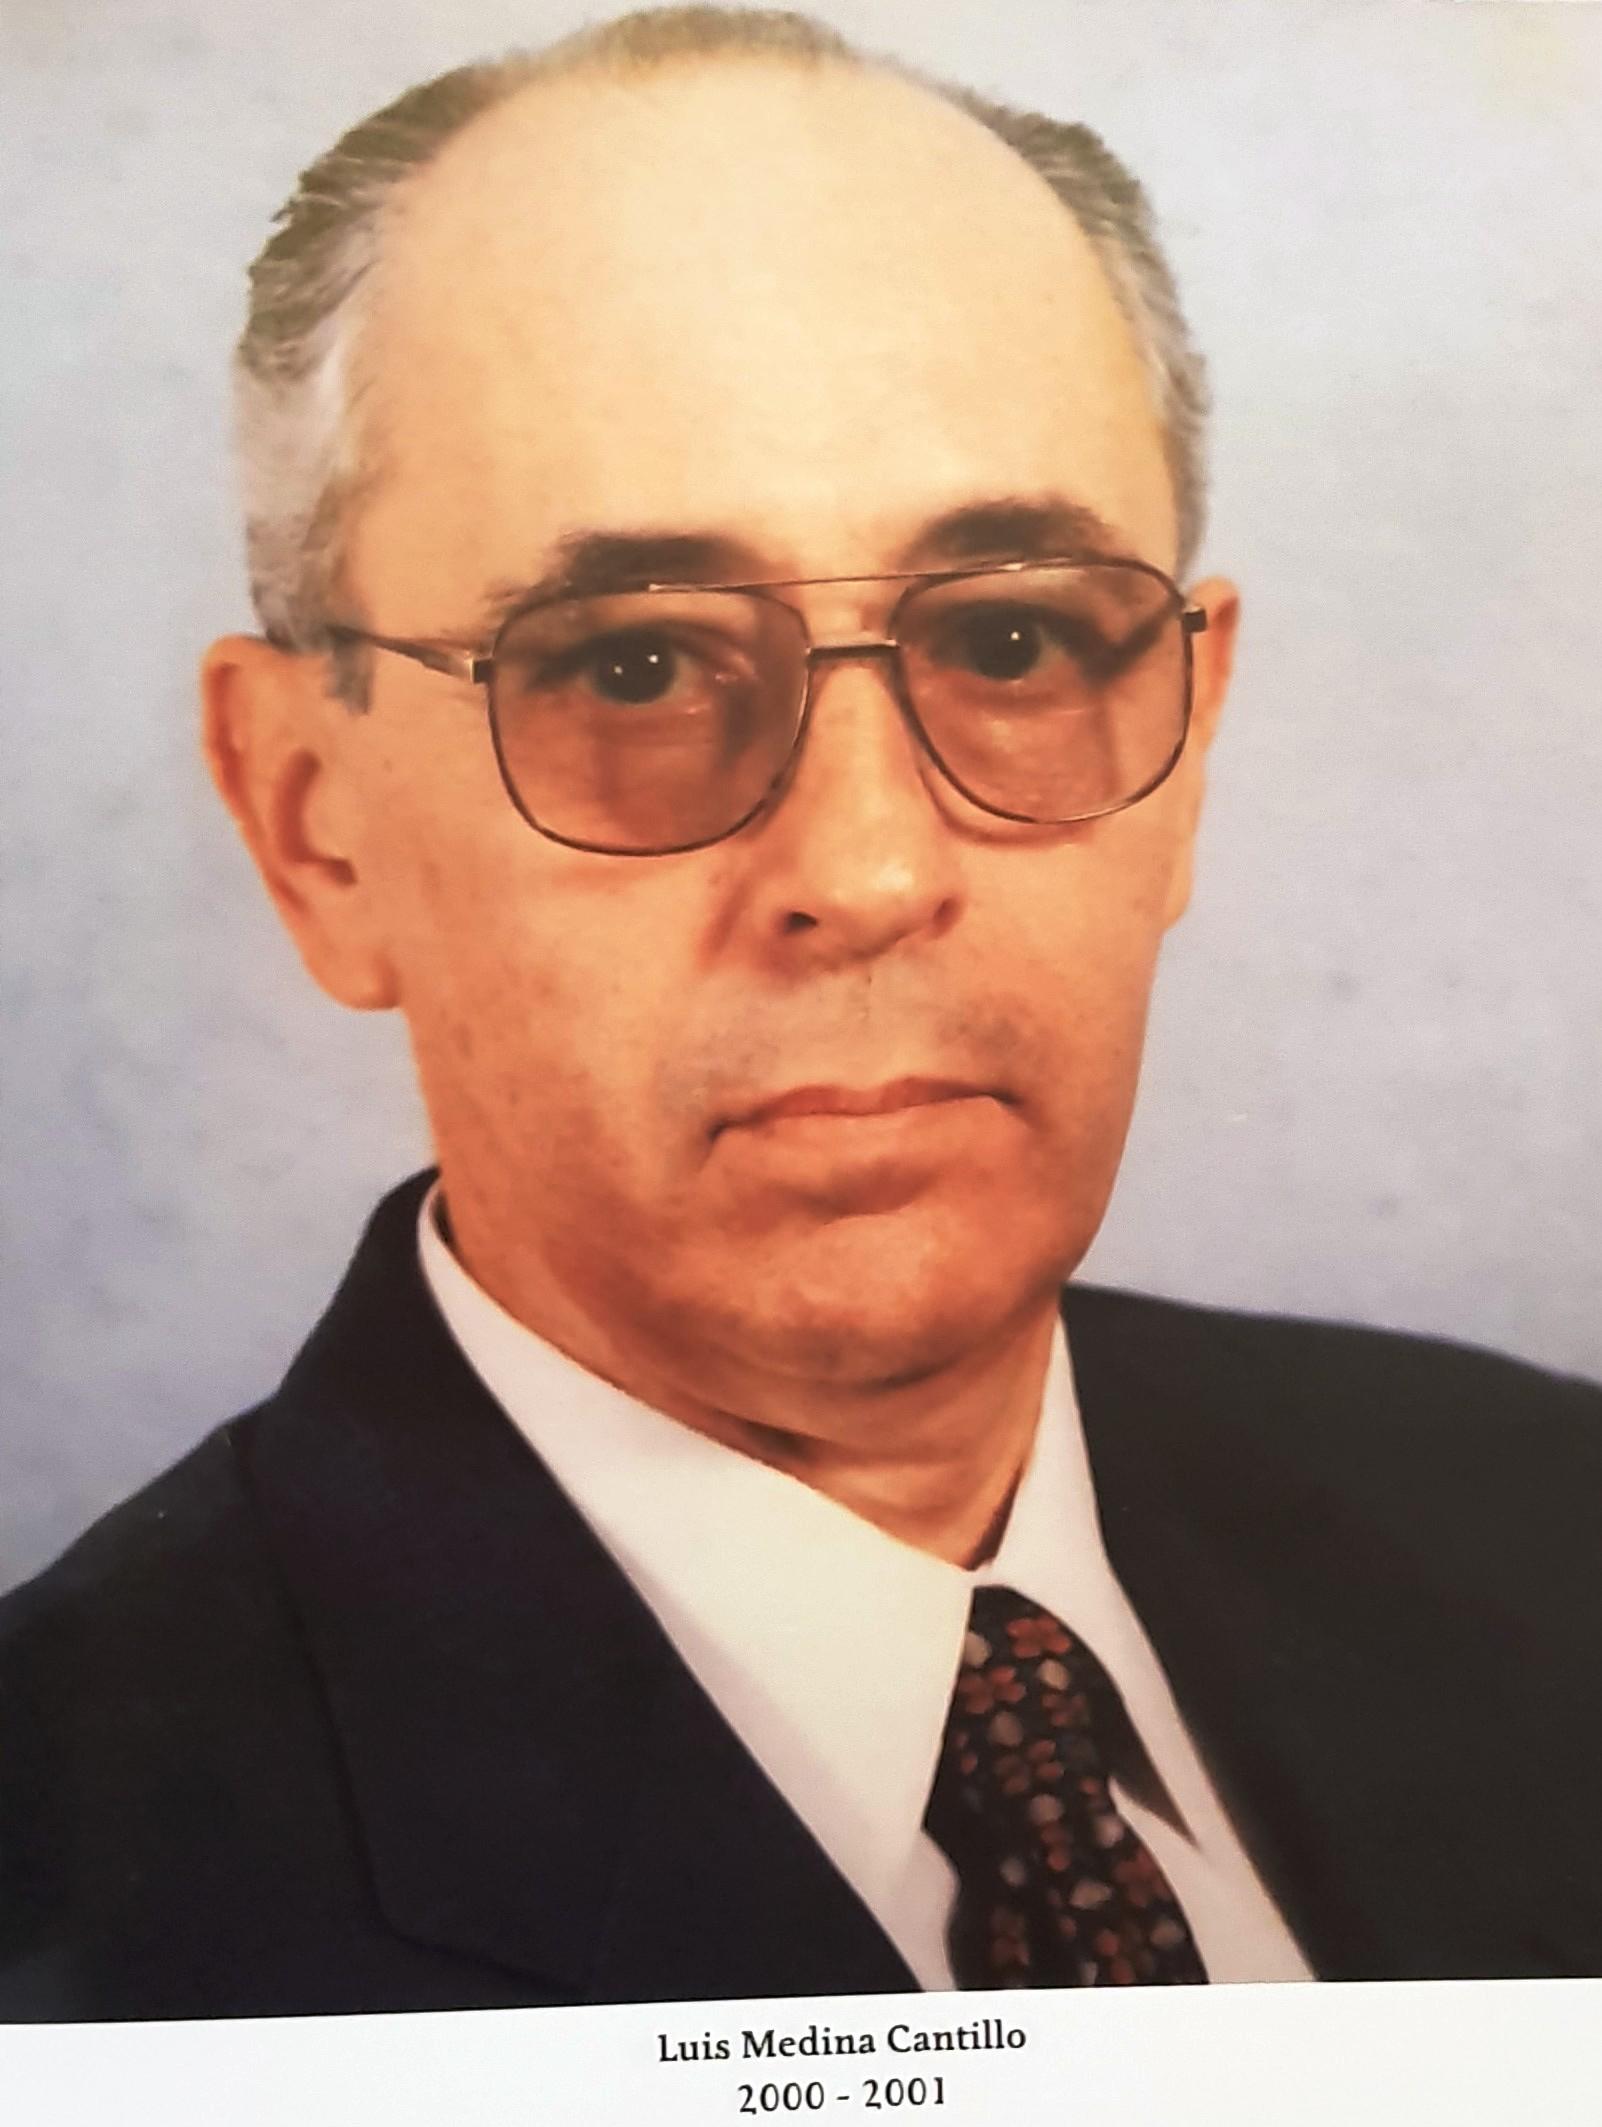 PRESIDENTE DE COPARMEX SR. LUIS MEDINA CANTILLO